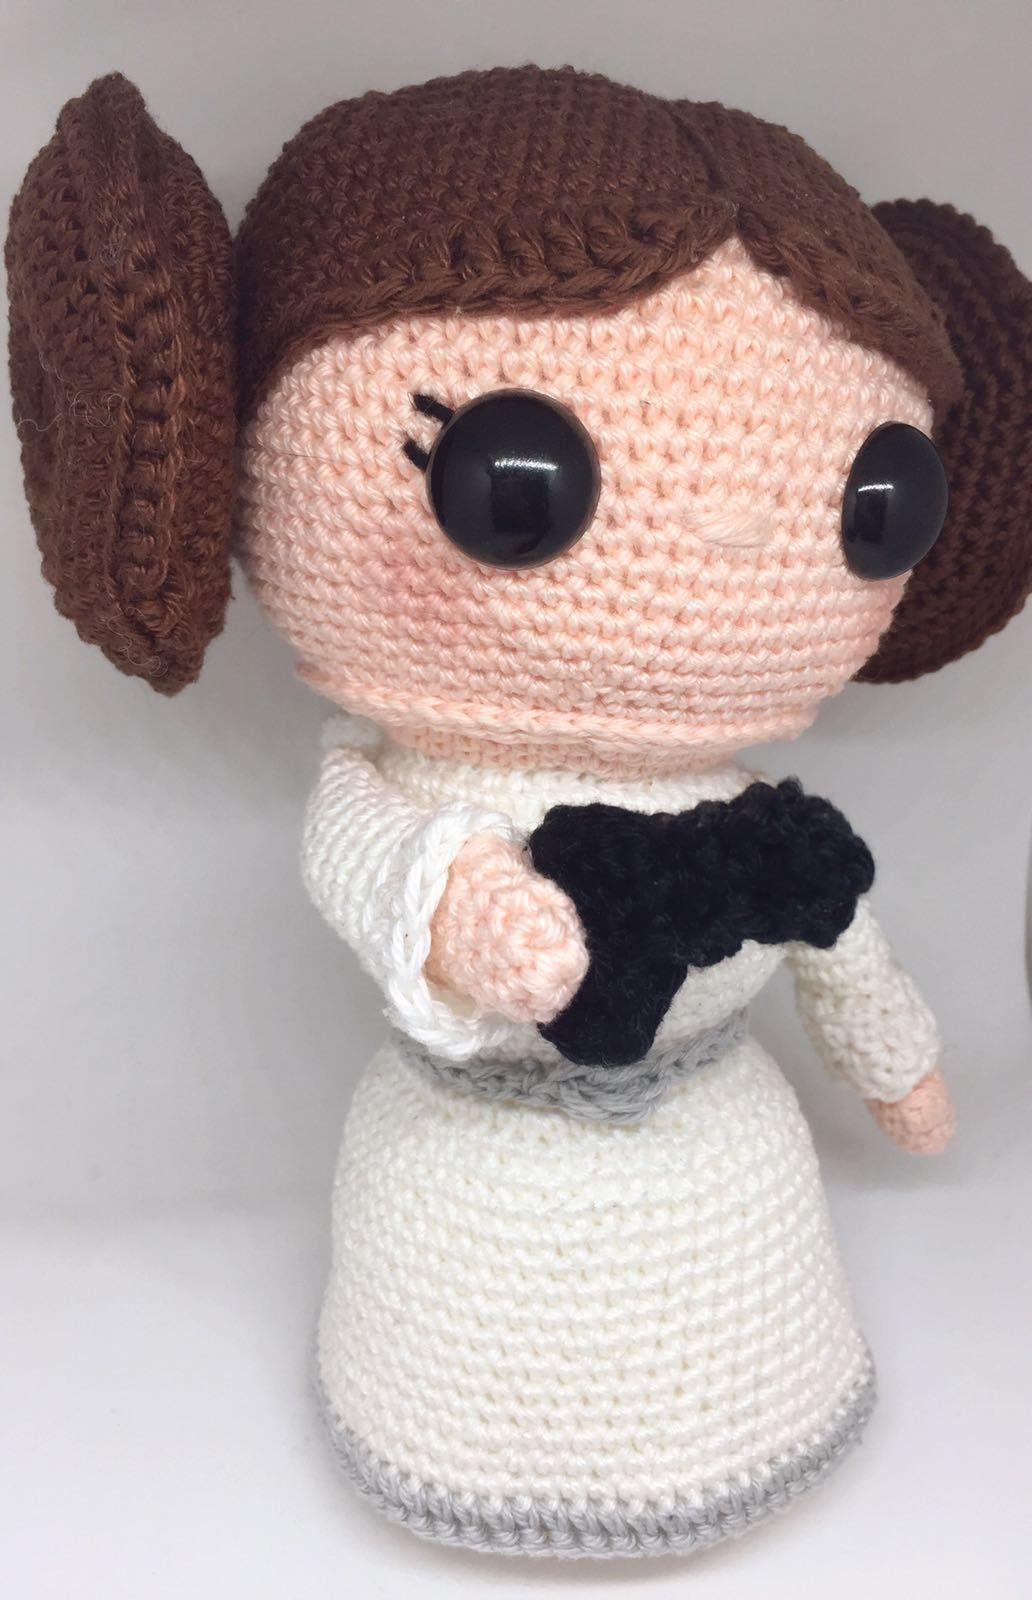 Amigurumi Crochet Princess Leia Organa   Etsy   1600x1032